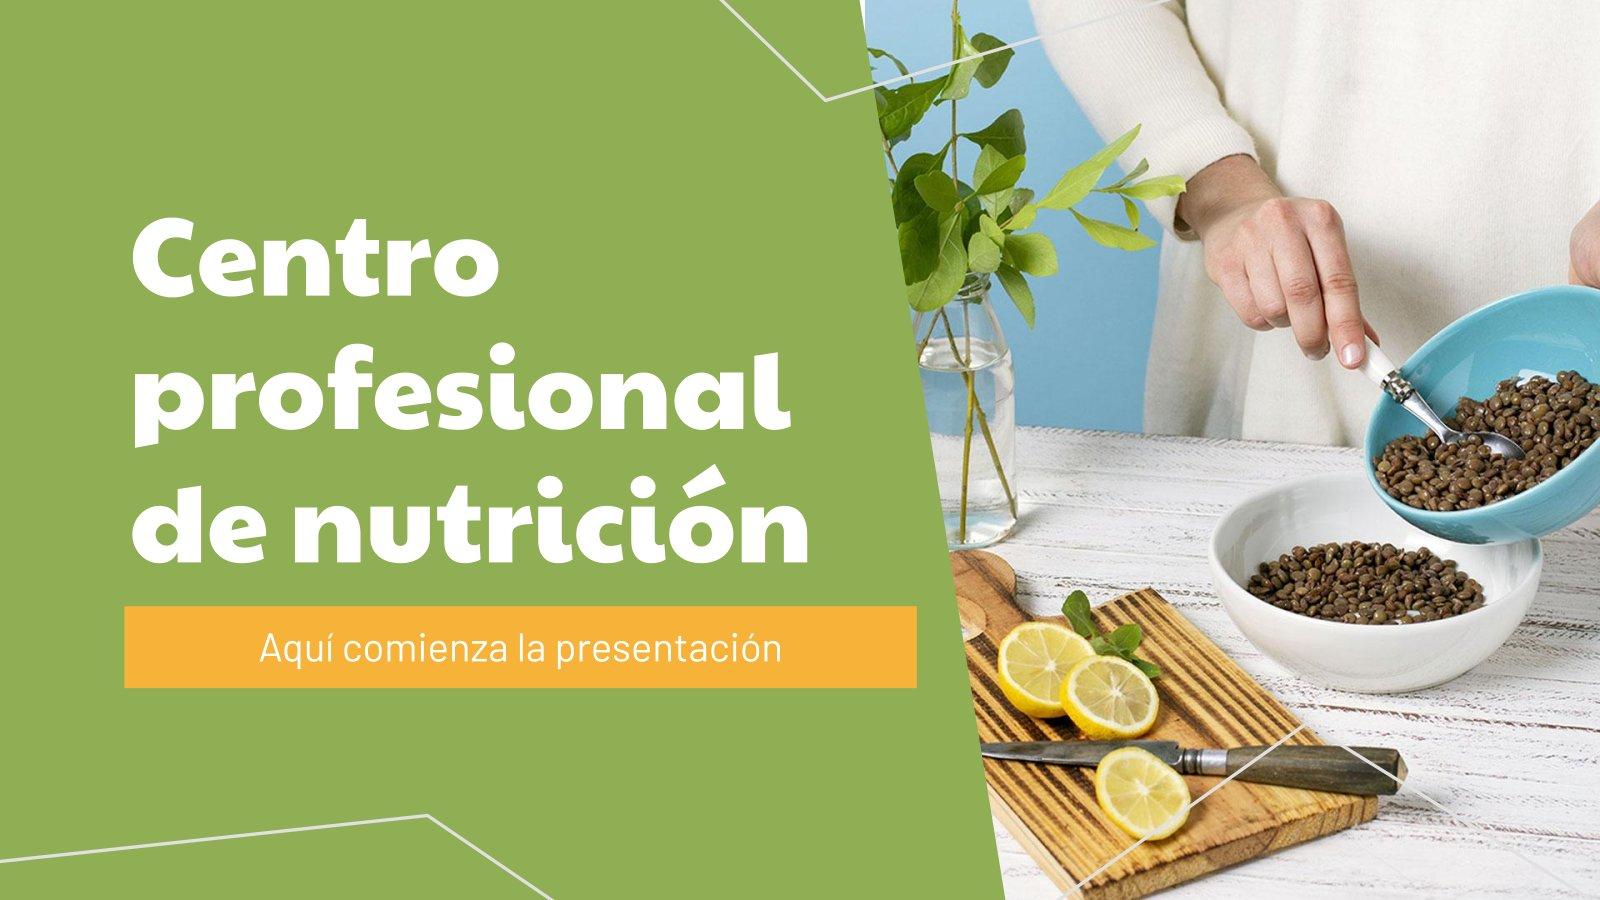 Professional Nutrition Center presentation template